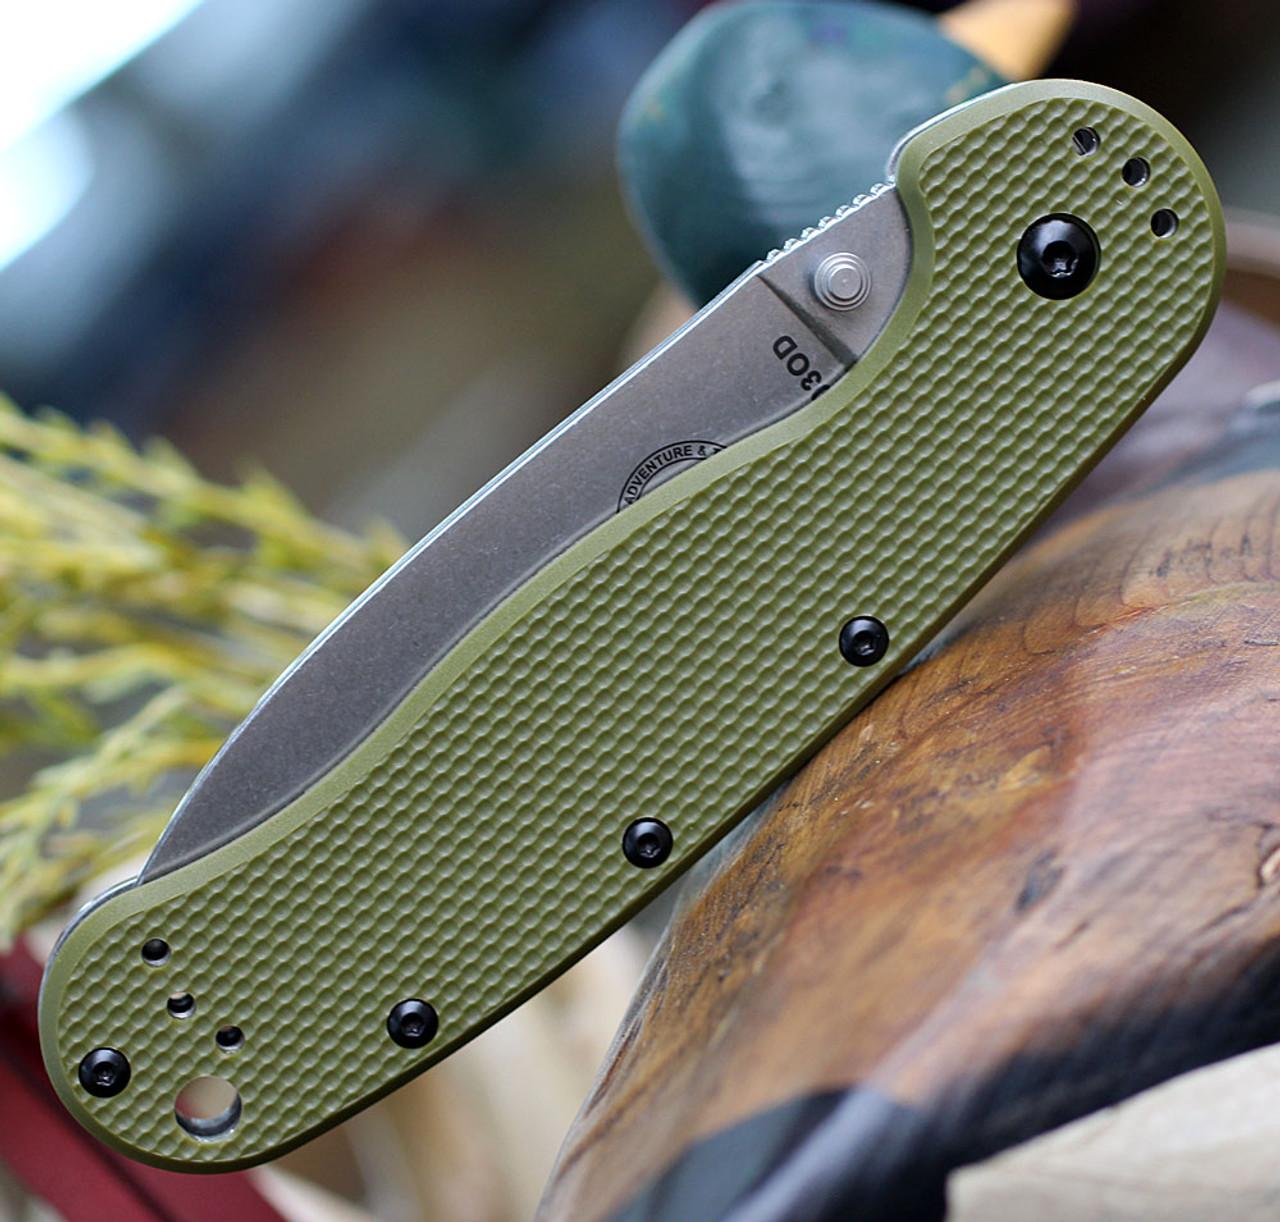 "Esee Avispa Framelock SK5 OD BRK1303OD, 3.65"" SK5 High Carbon Steel Plain Blade, OD Green Nylon Handles"